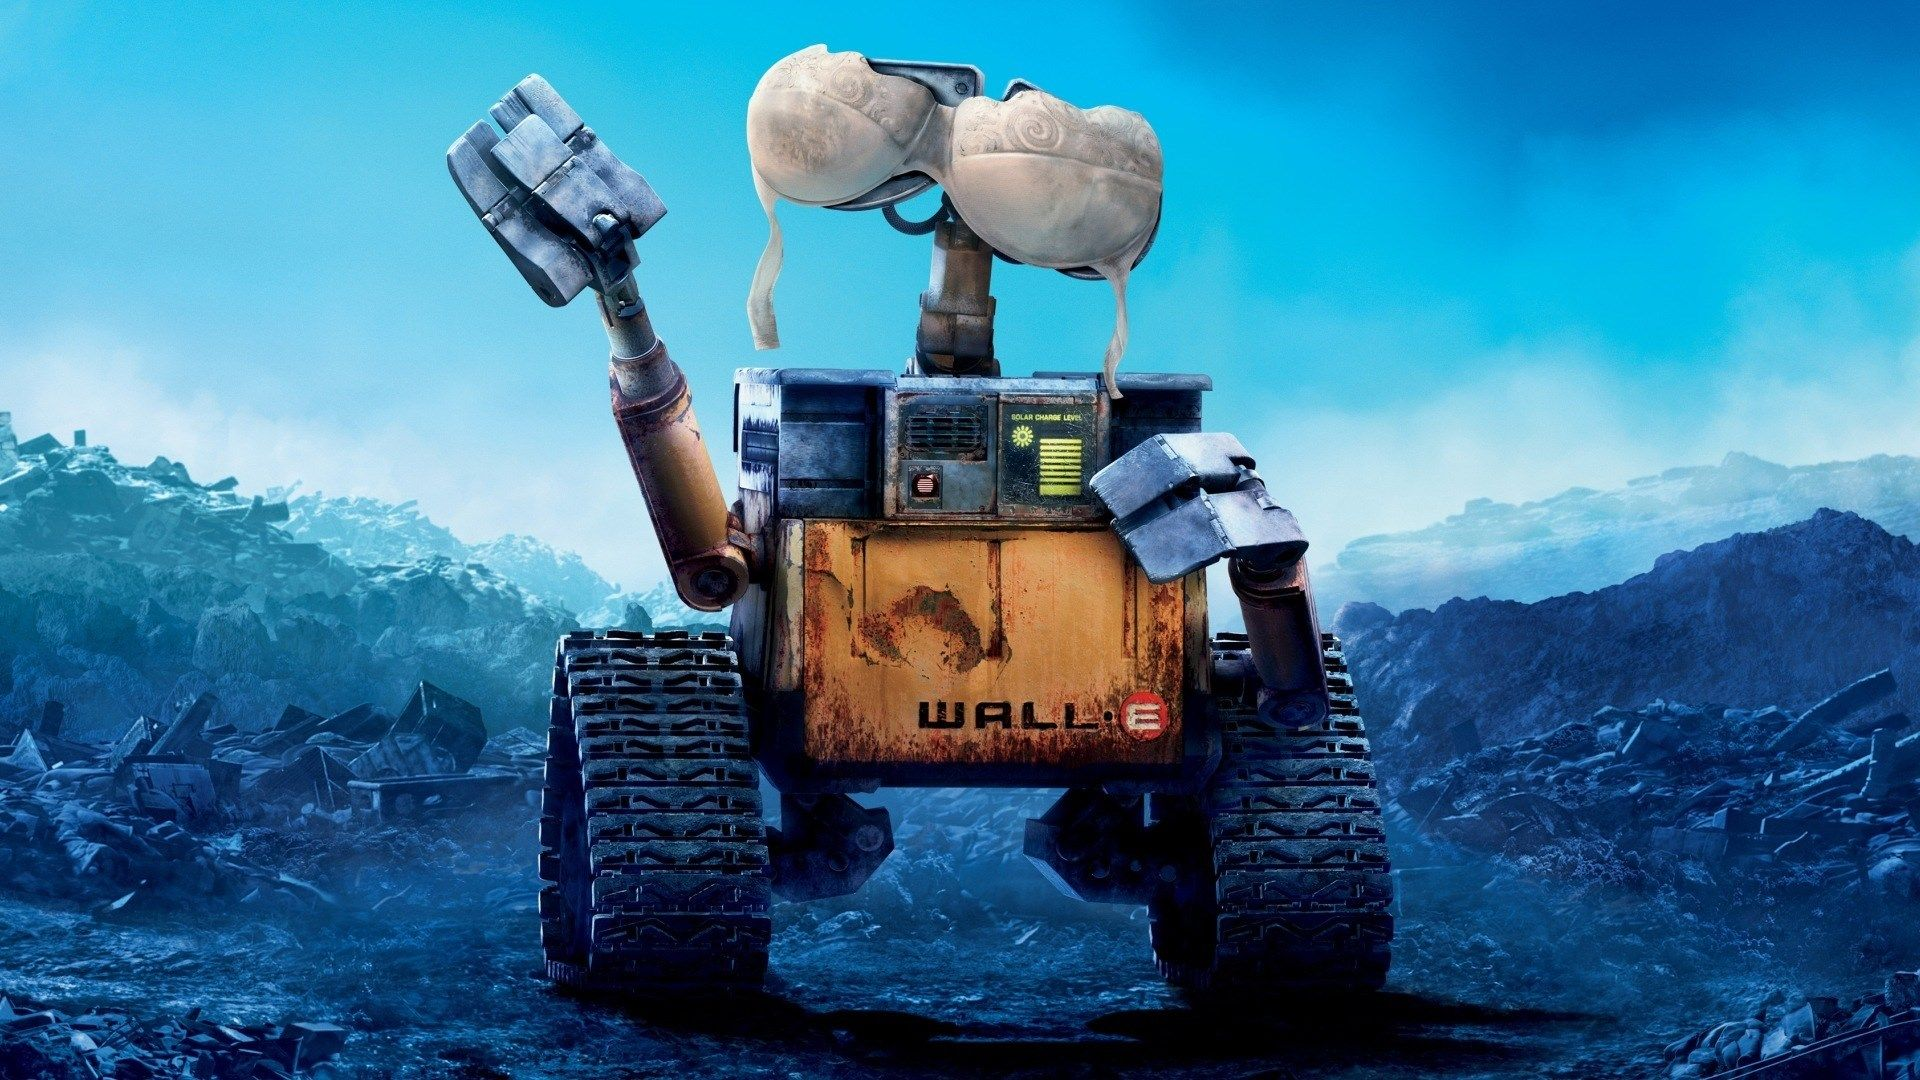 WALL·E Pixar Animation Studios Movies Stars Sky Space